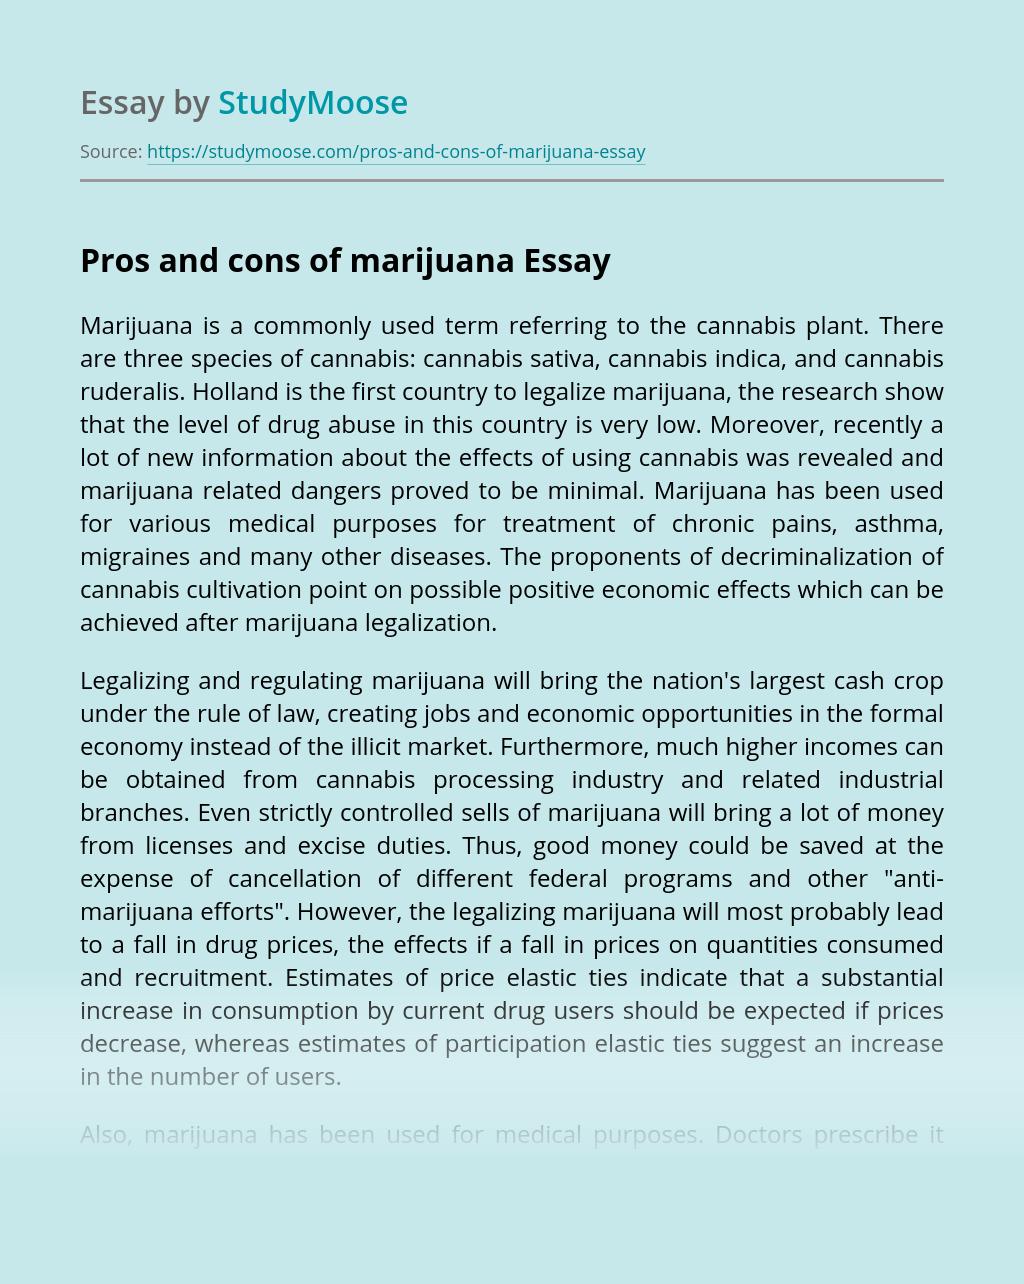 Pros and cons of marijuana